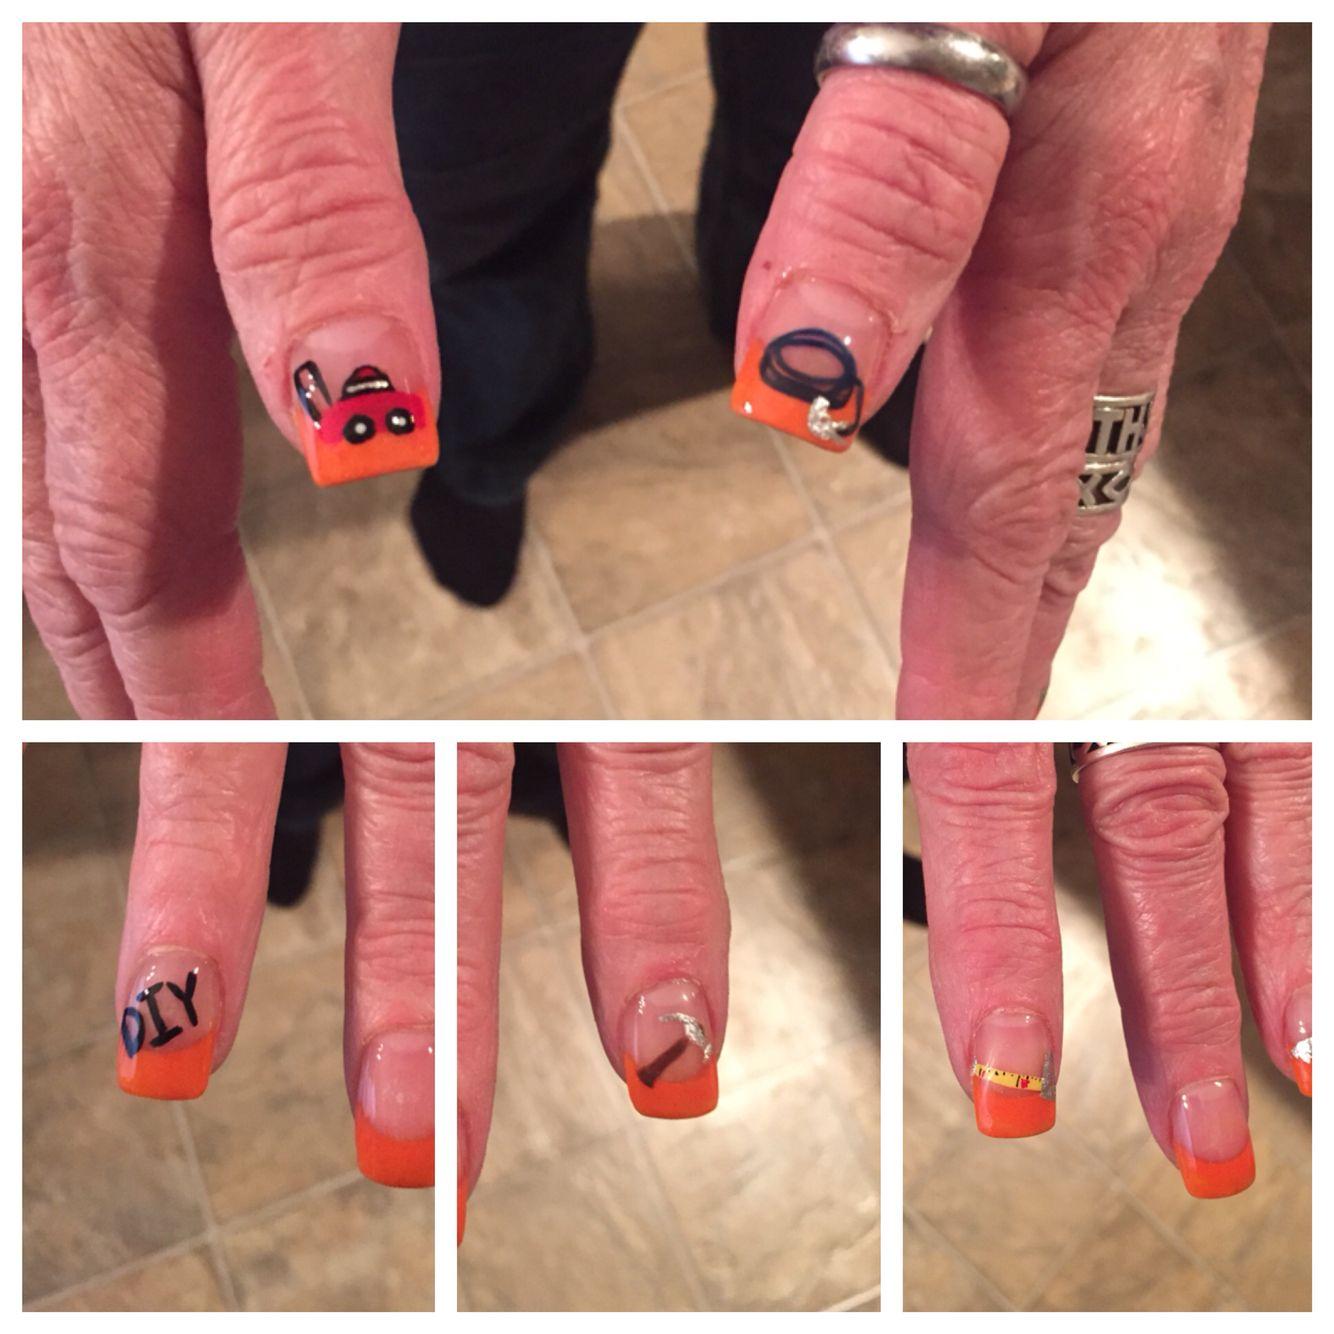 Home Depot Nail Art | Lisa\'s client\'s nails | Pinterest | Lisa s